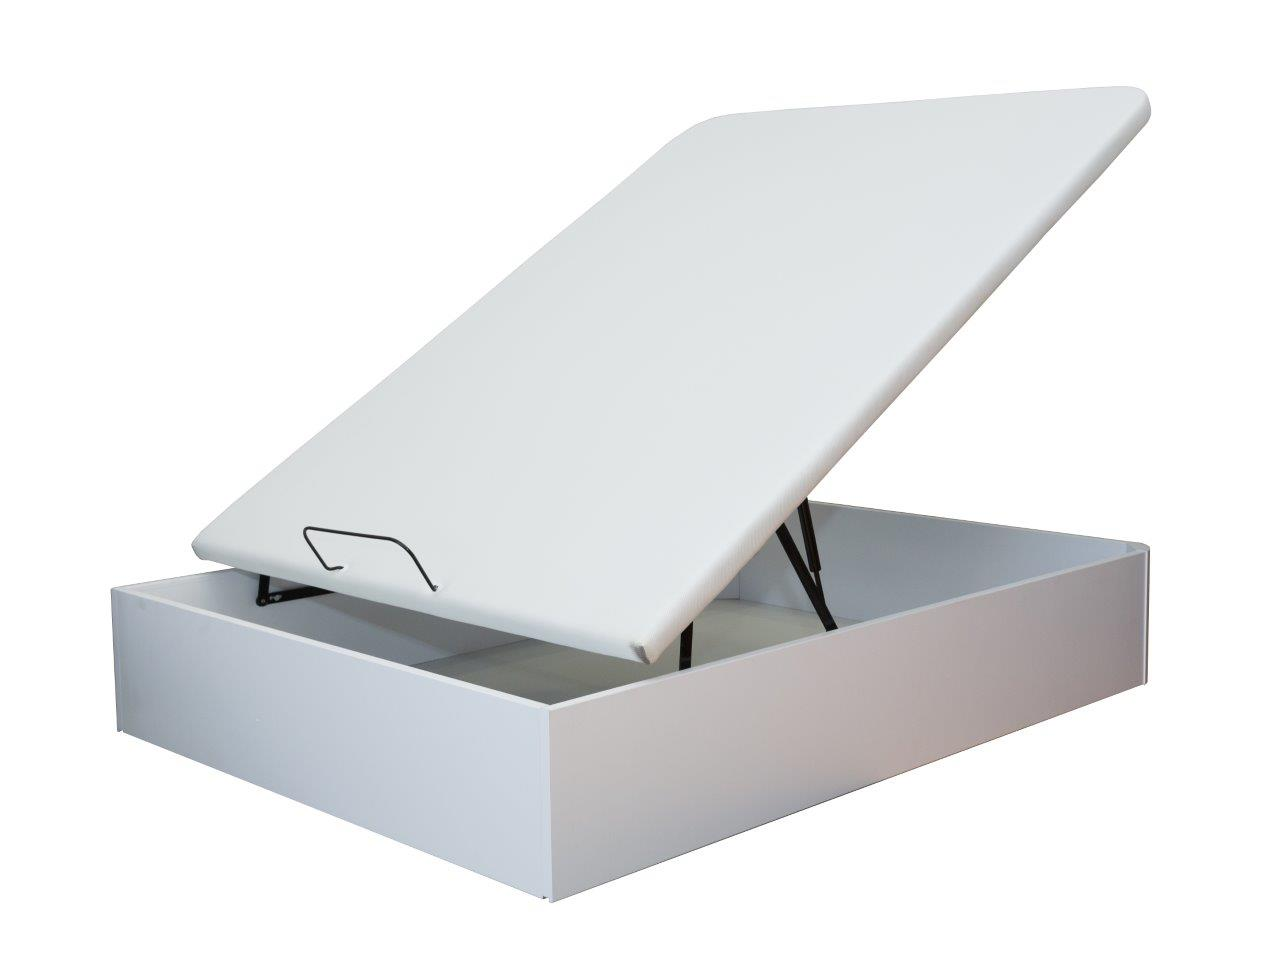 Canapé Blanco FLEX BOX 3D II ◇ 455716